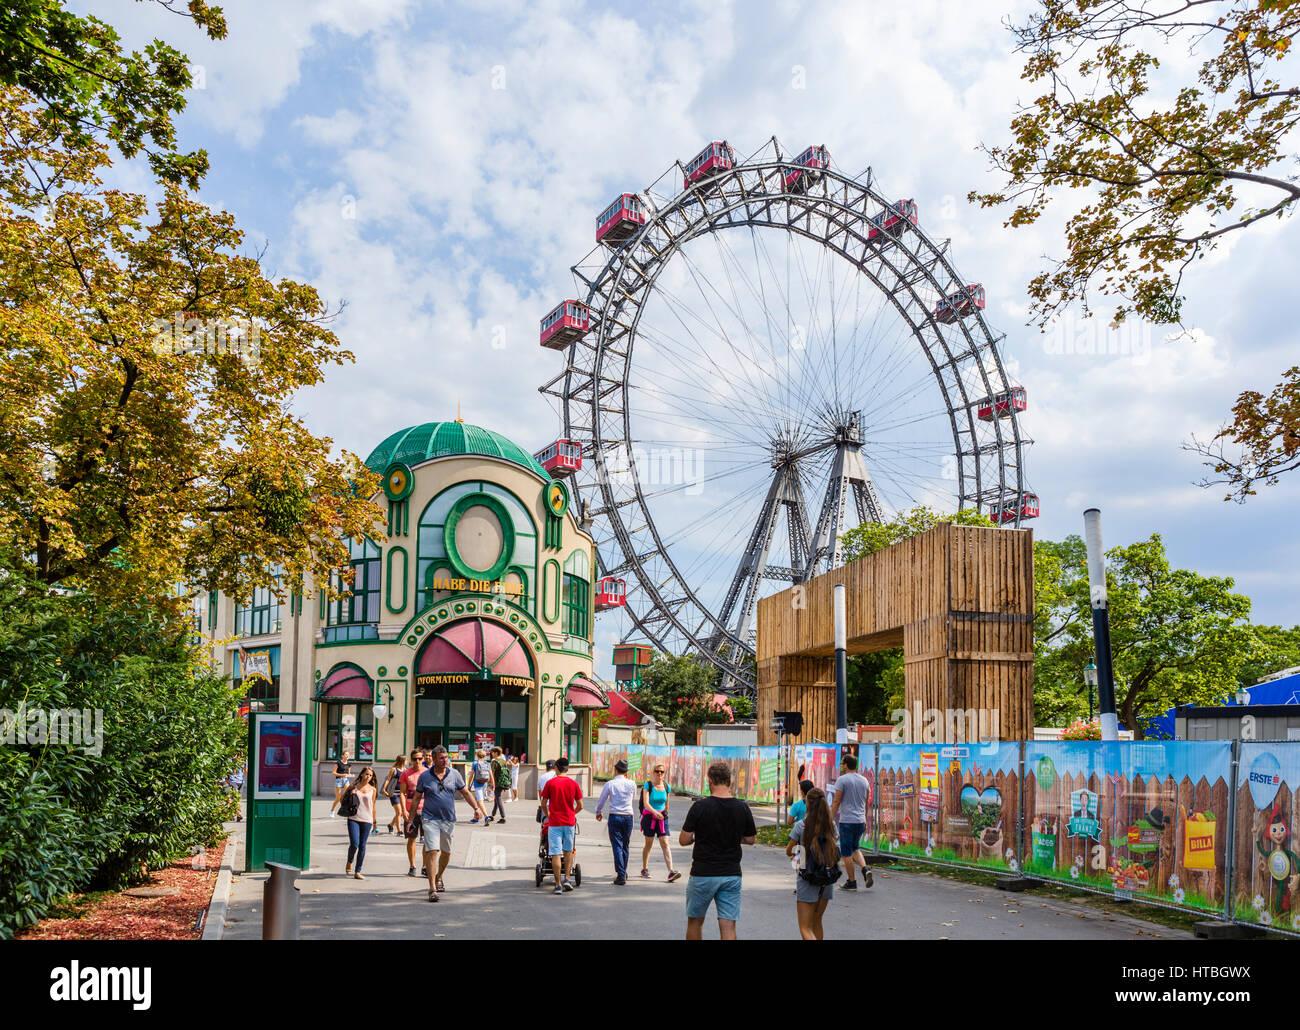 Vienna, Prater. Entrance to the Prater amusement park looking towards the Wiener Riesenrad (Ferris Wheel), Vienna, - Stock Image